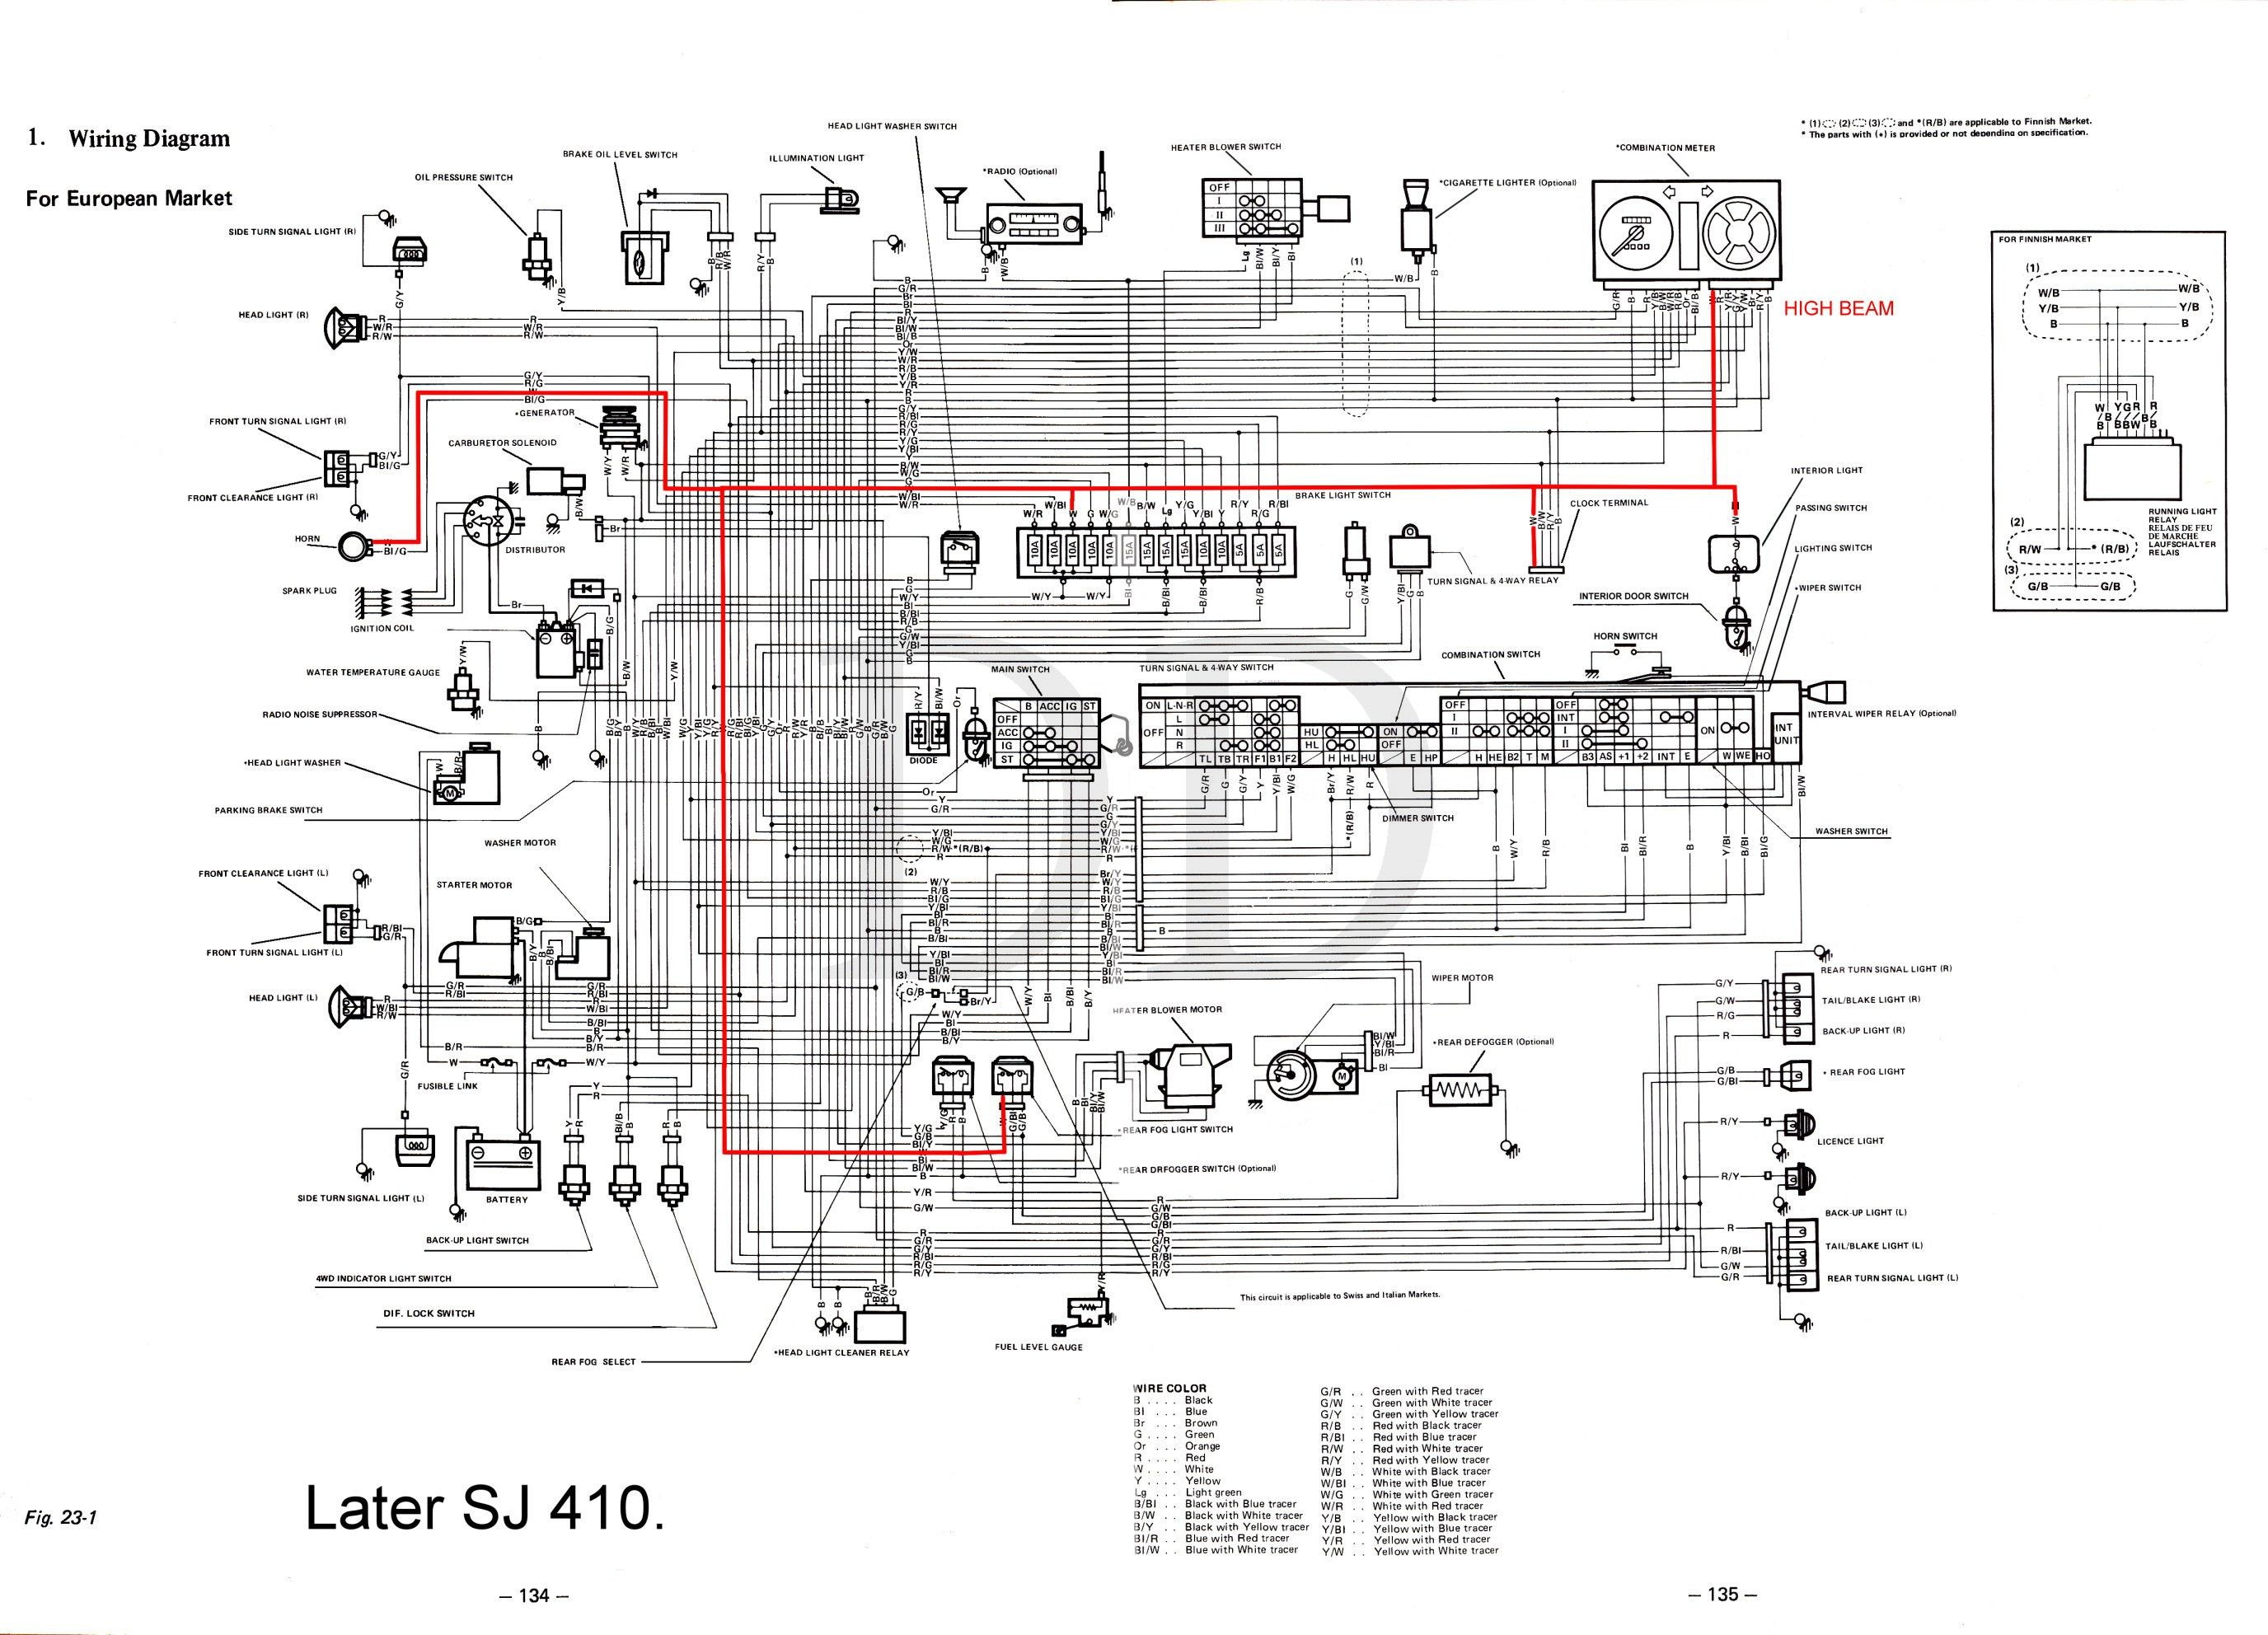 John Deere L130 Wiring Diagram Elegant | Wiring Diagram Image